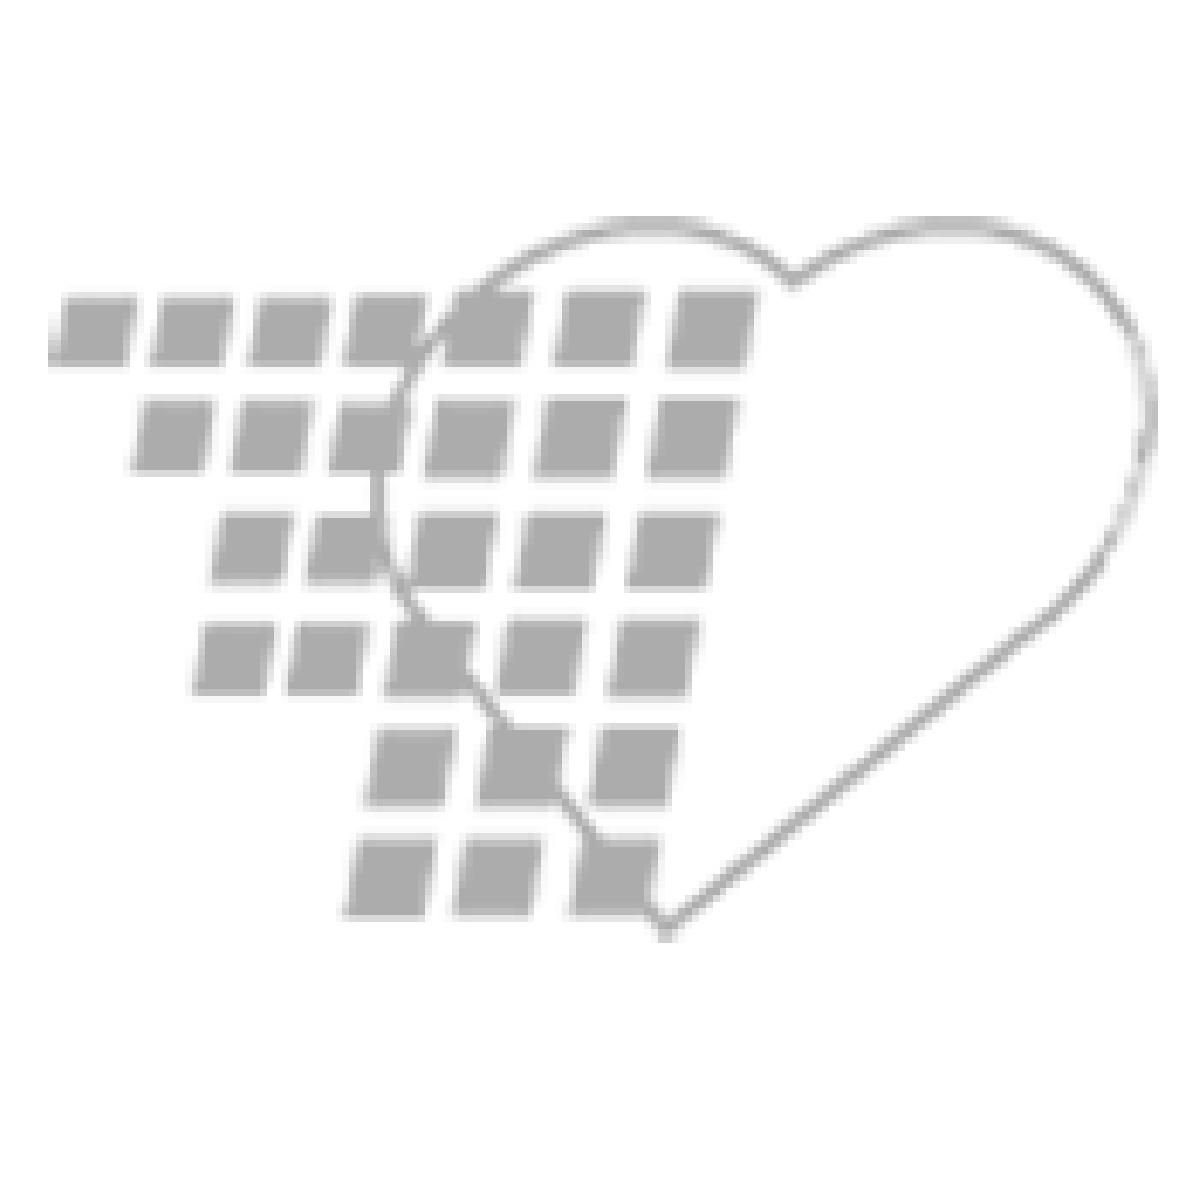 02-70-4070-CHLD - Satin   MacIntosh Blade